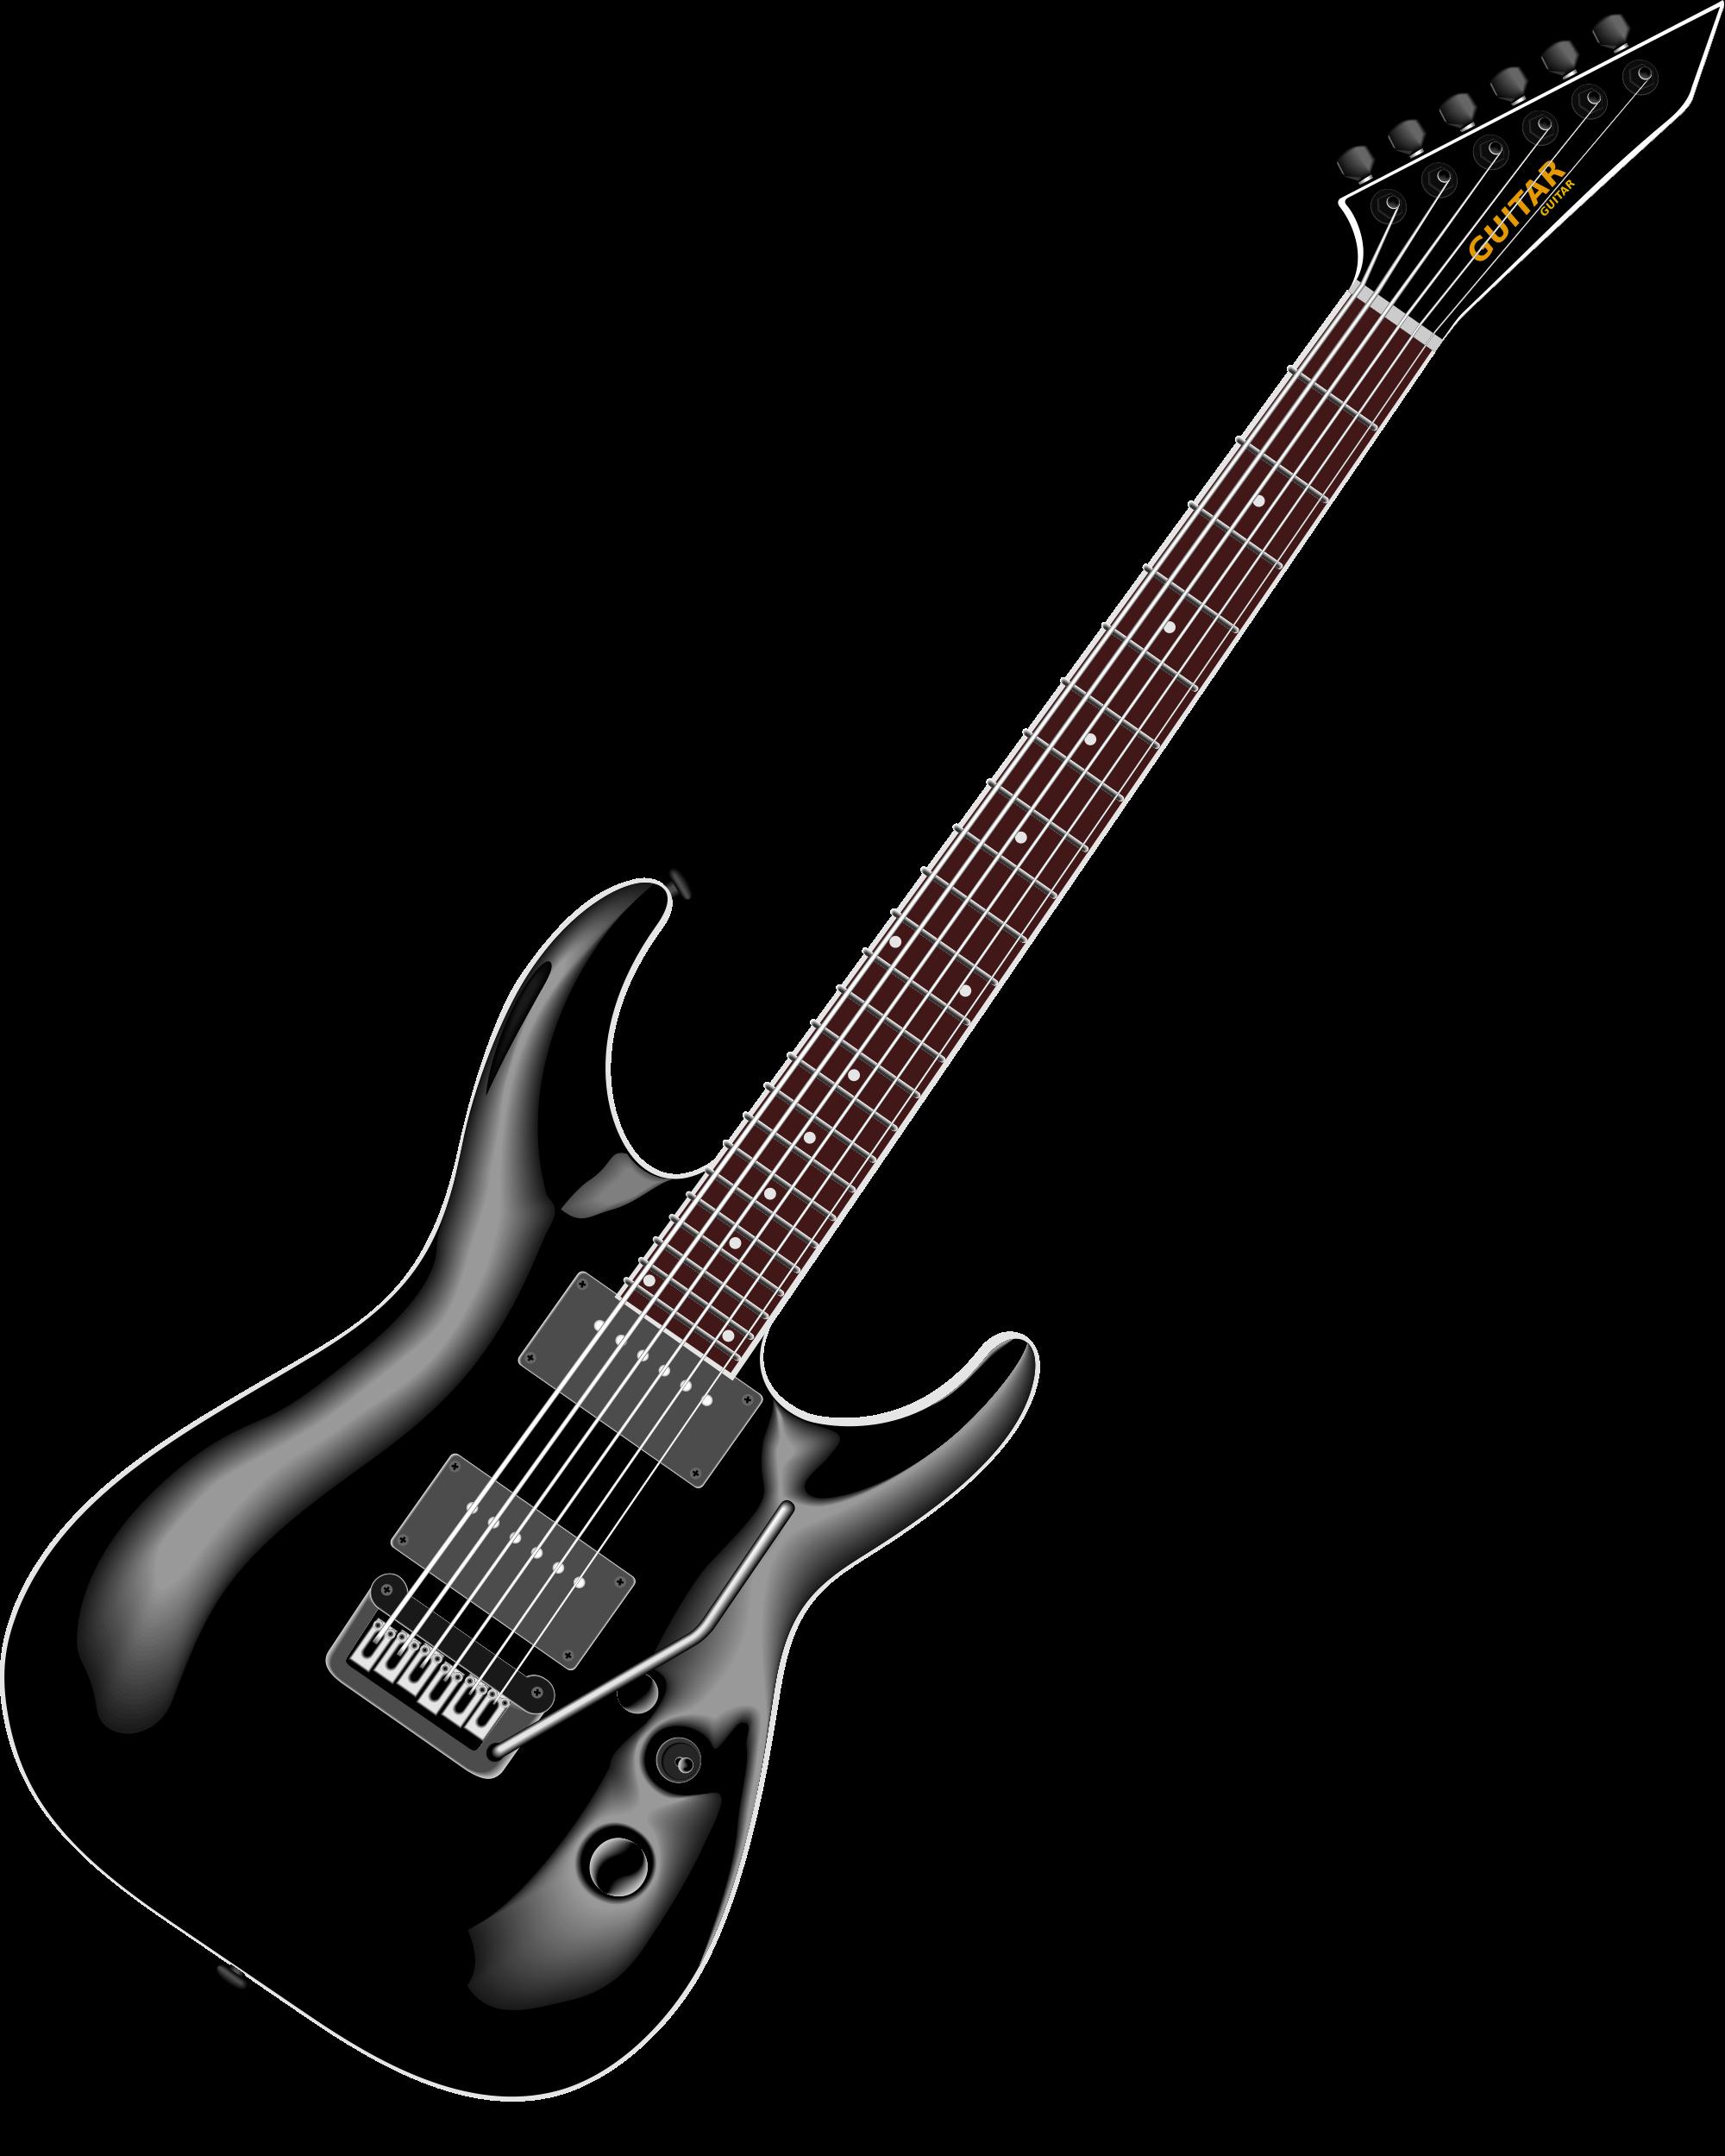 Clip art shop of. Clipart guitar simple